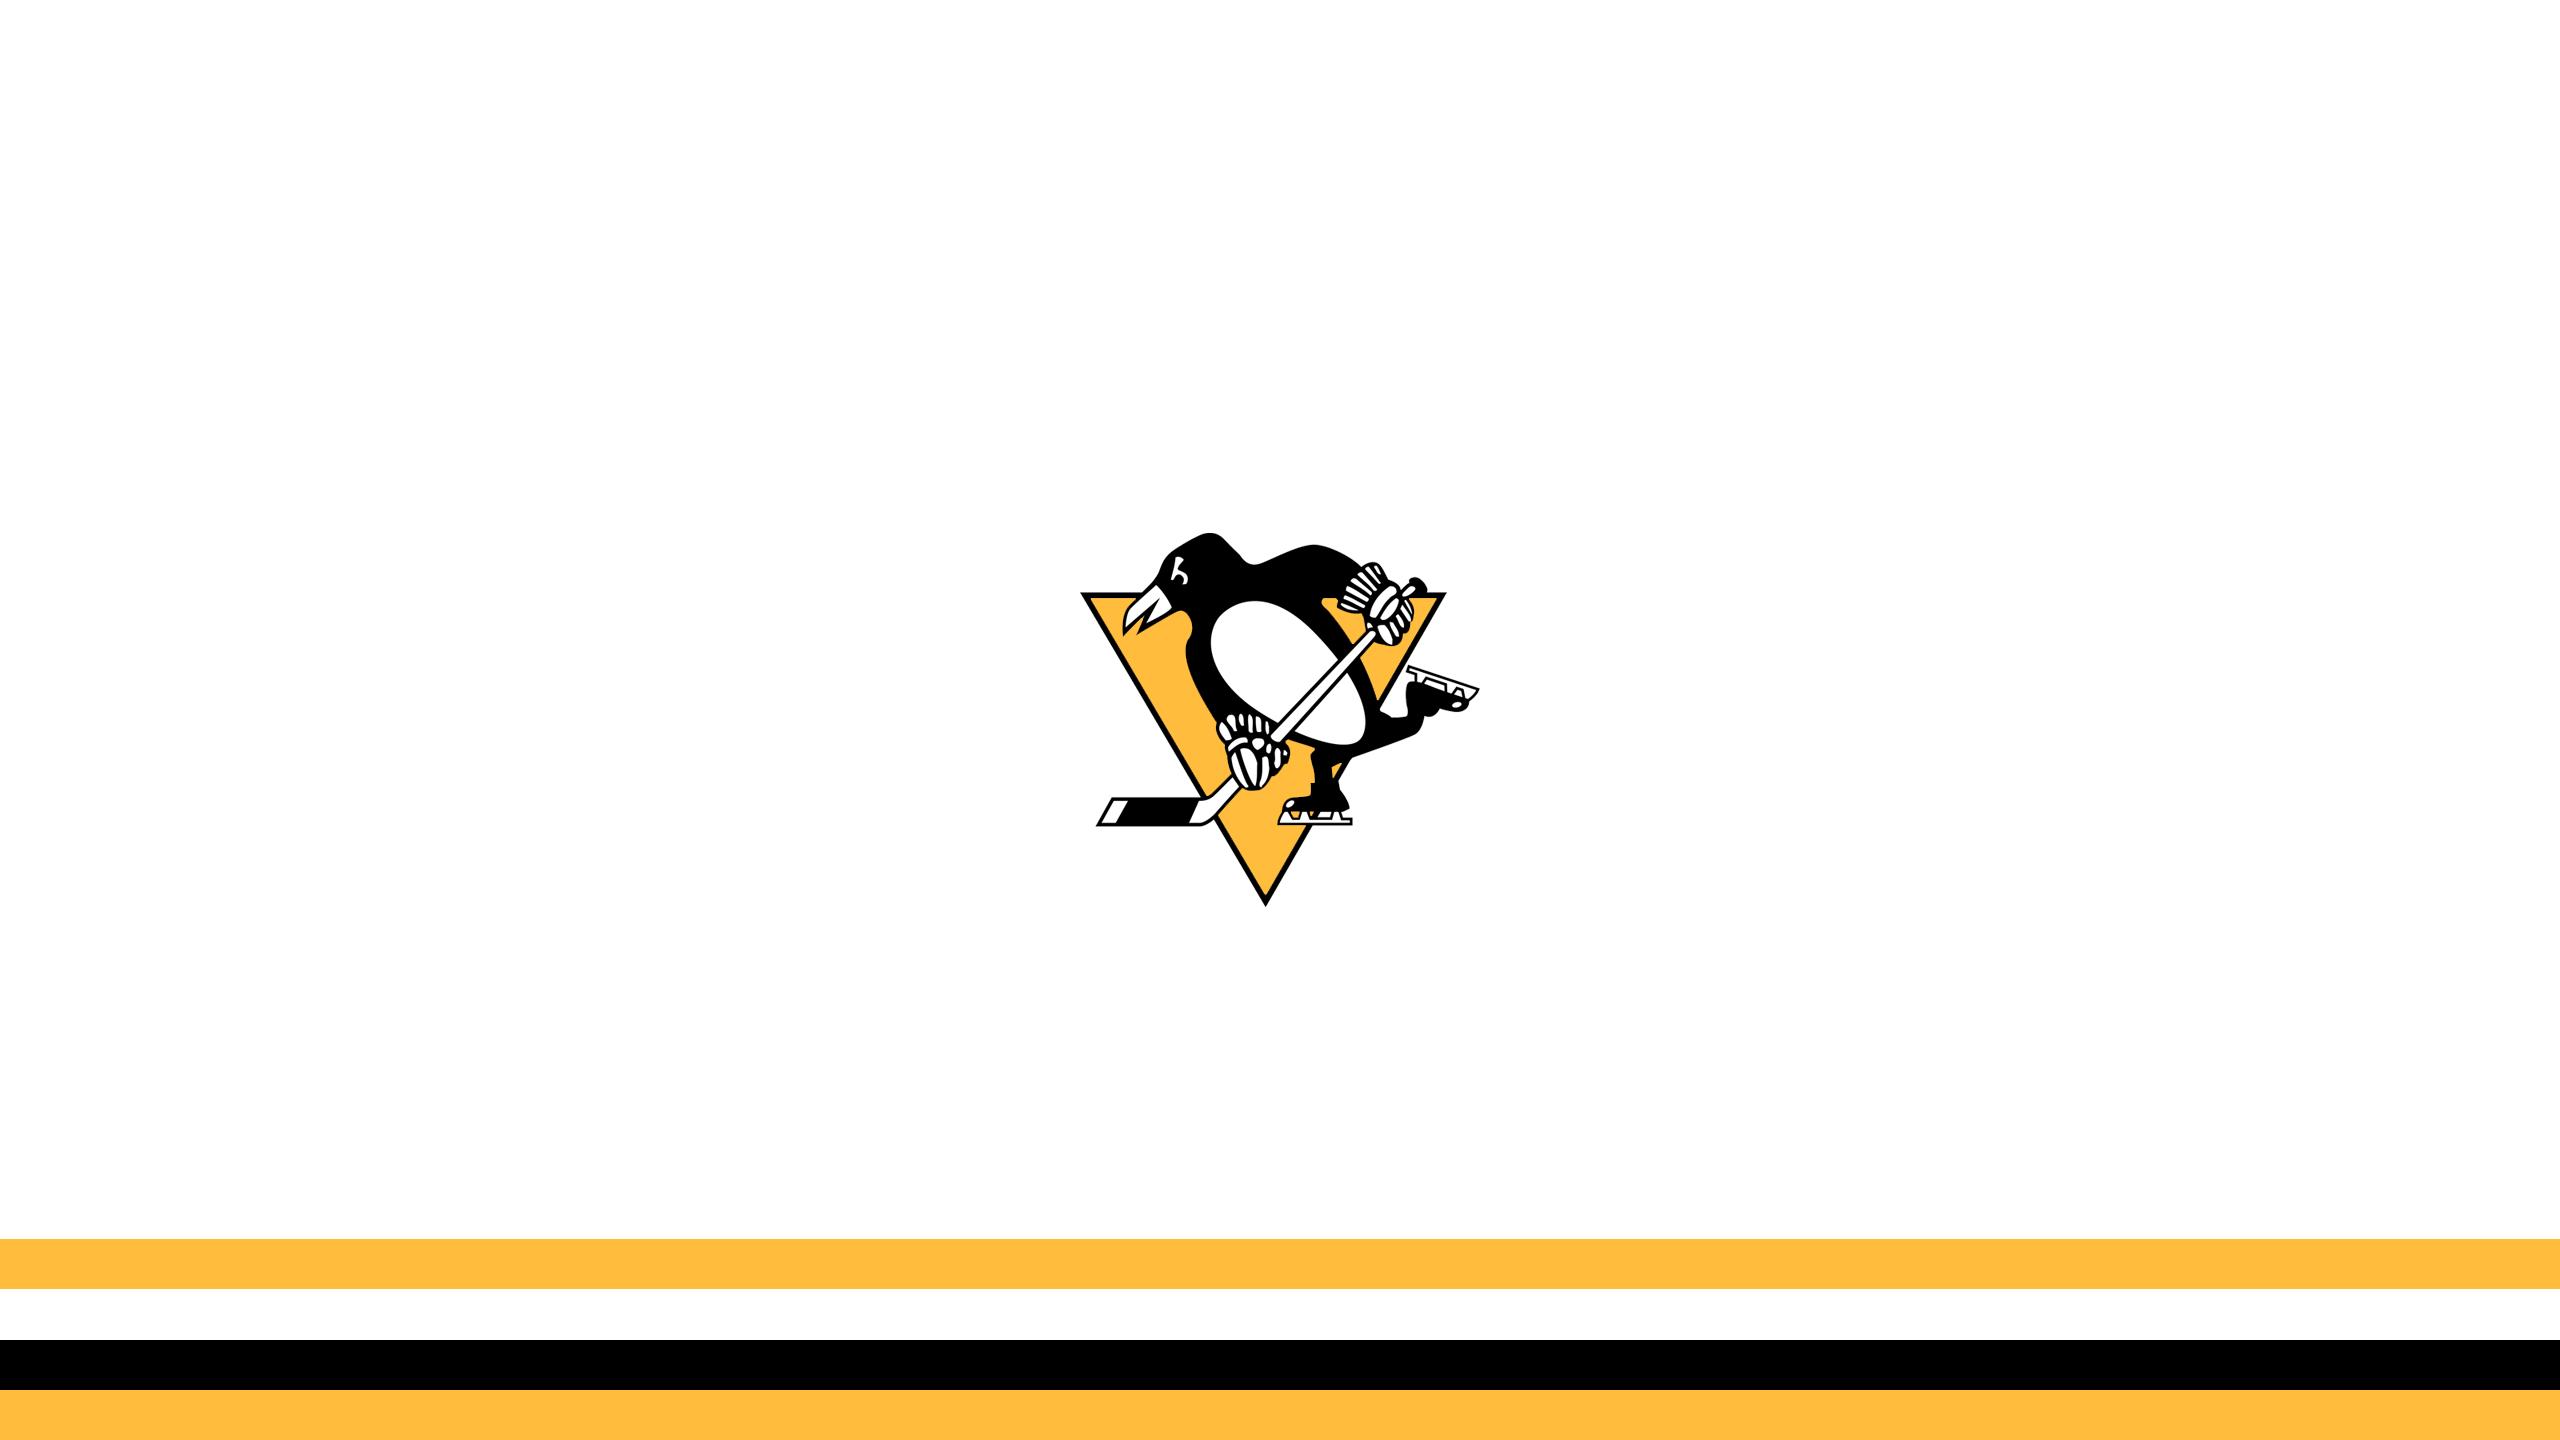 Pittsburgh Penguins (Away)